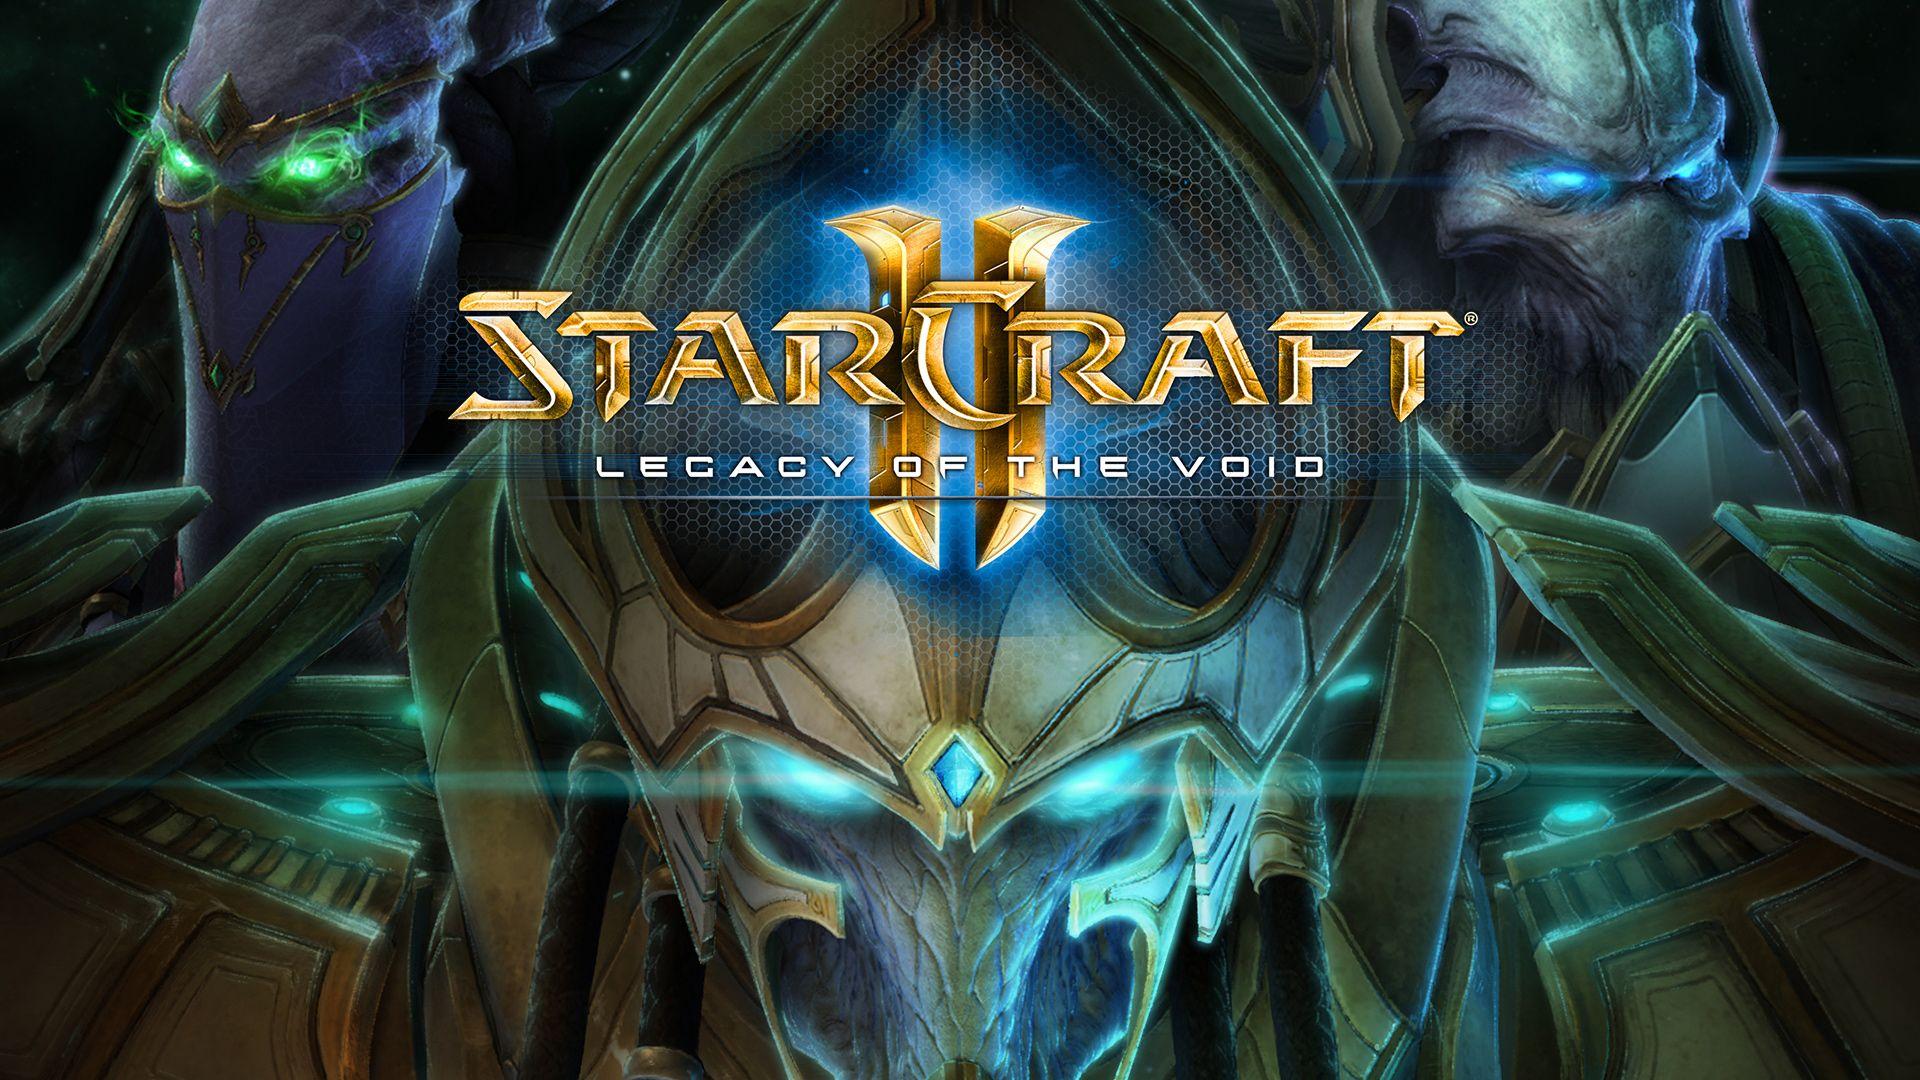 Starcraft Ii Legacy Of The Void Starcraft Starcraft 2 Video